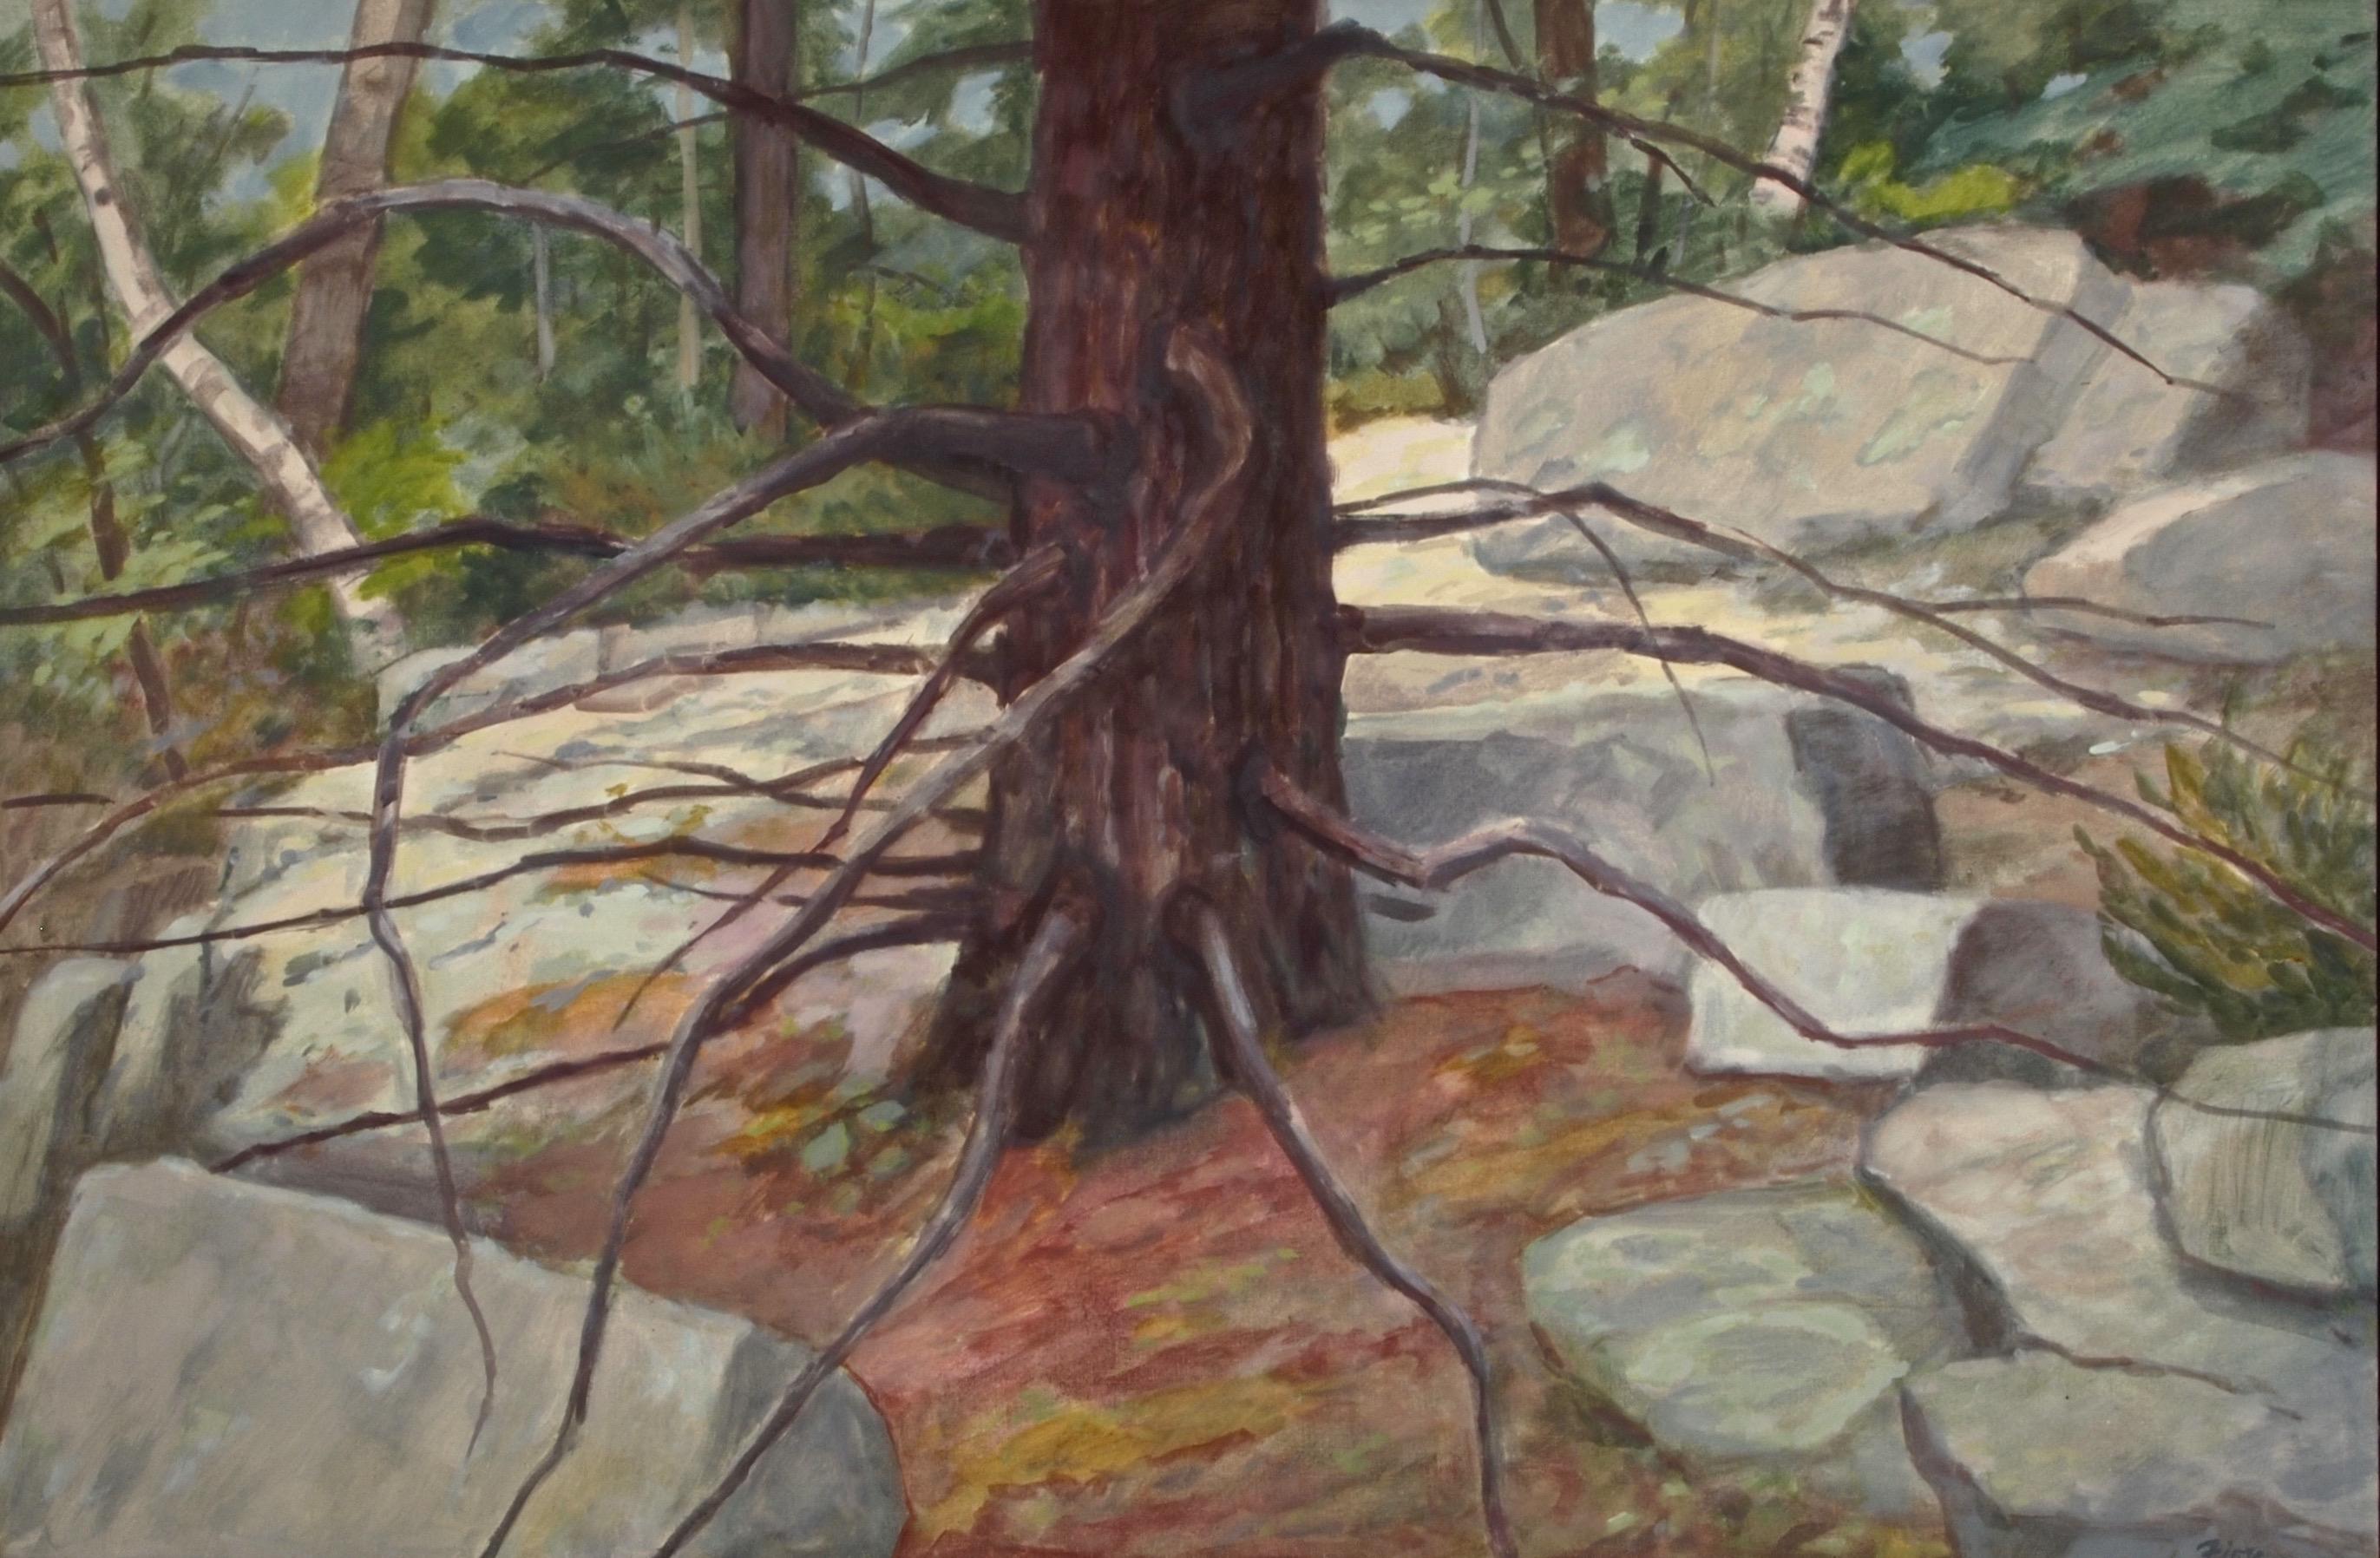 Pine and Rocks